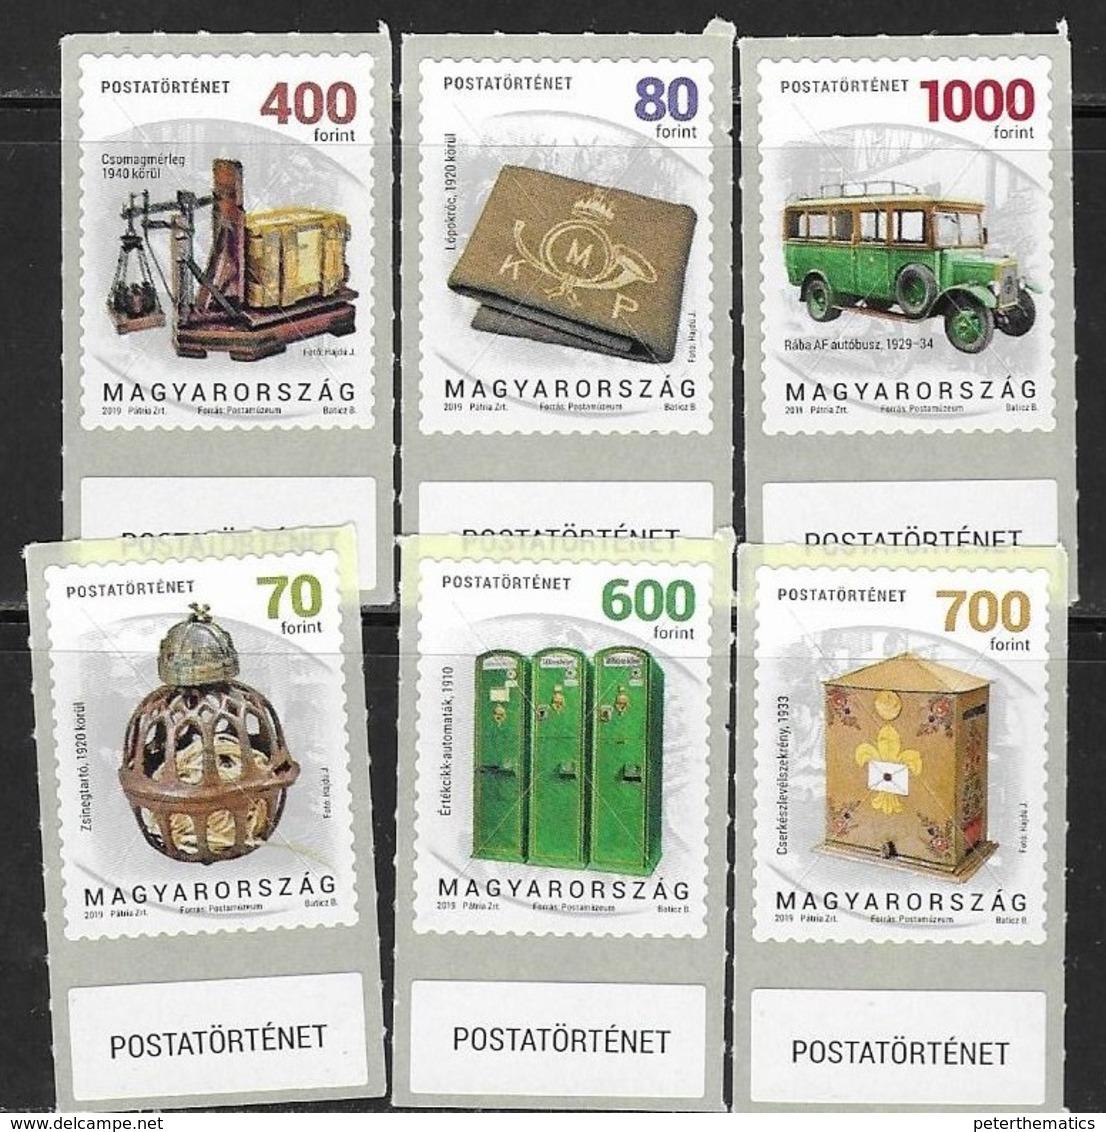 HUNGARY, 2019, MNH,POSTAL HISTORY, VEHICLES, PART III, 6v - Posta